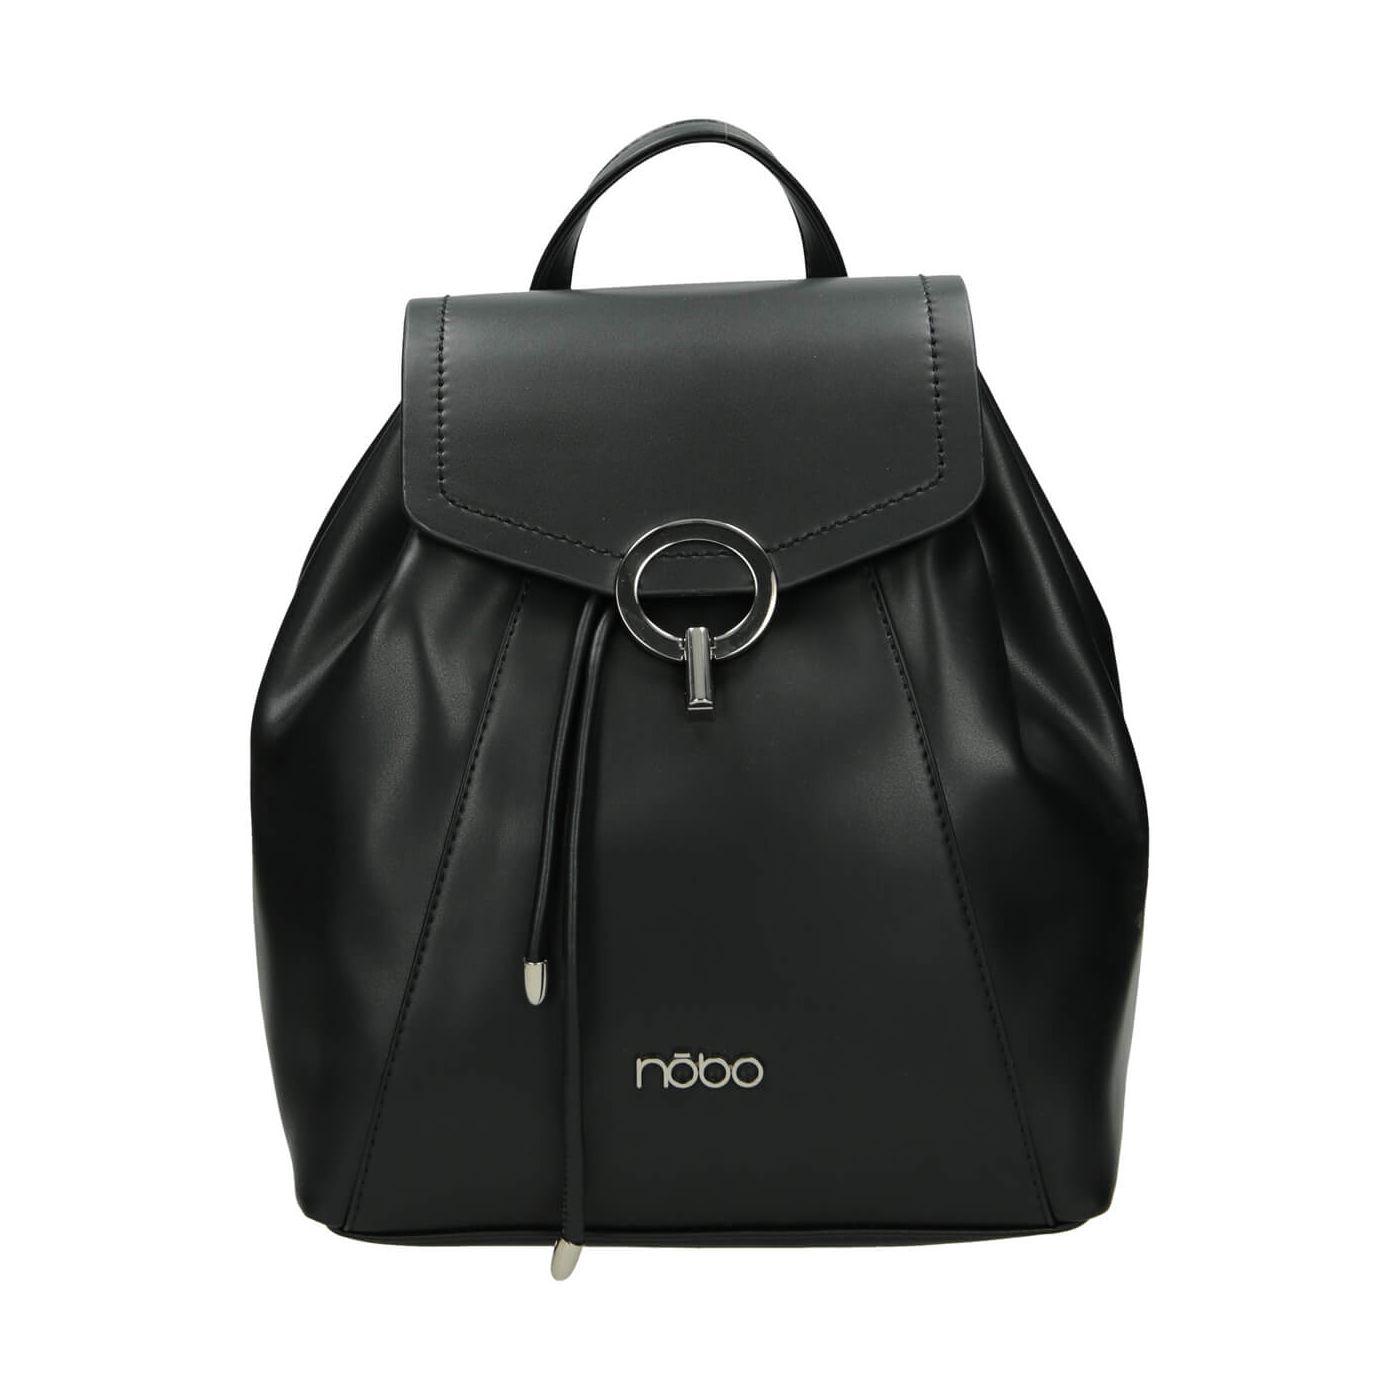 Nobo Woman's Backpack NBAG-I0480-C020